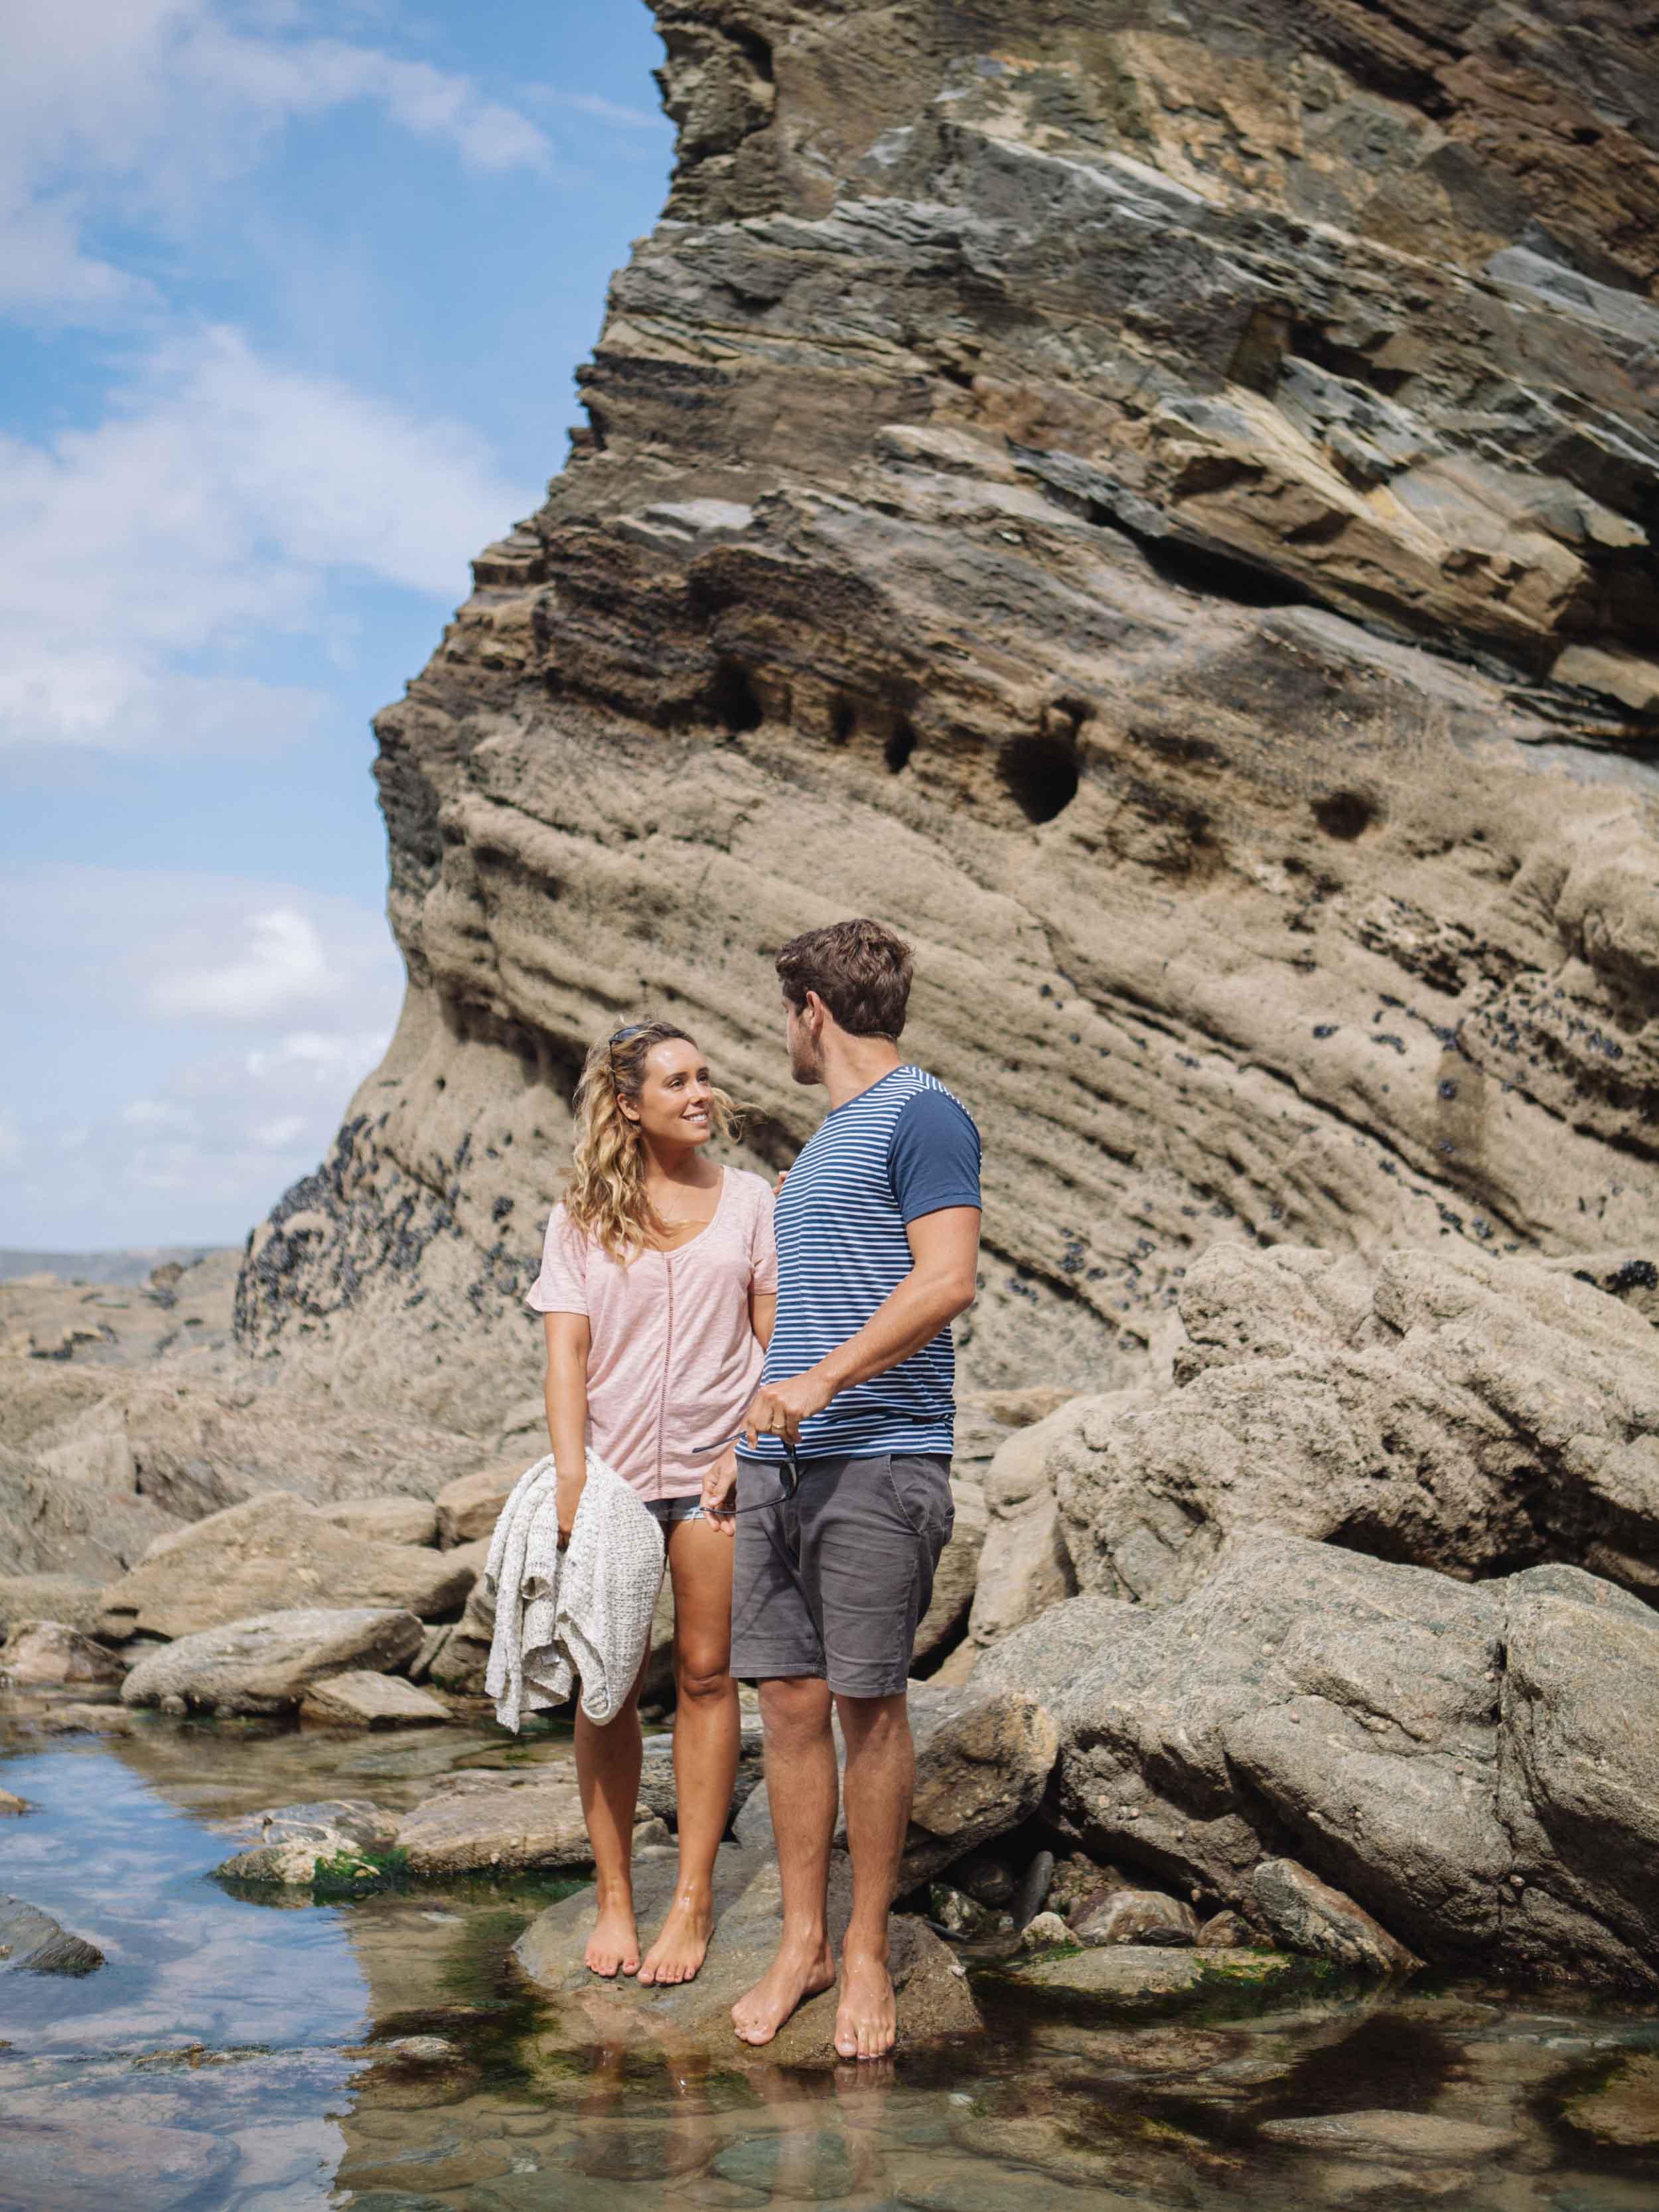 beach-retreats-cornwall-2017-20